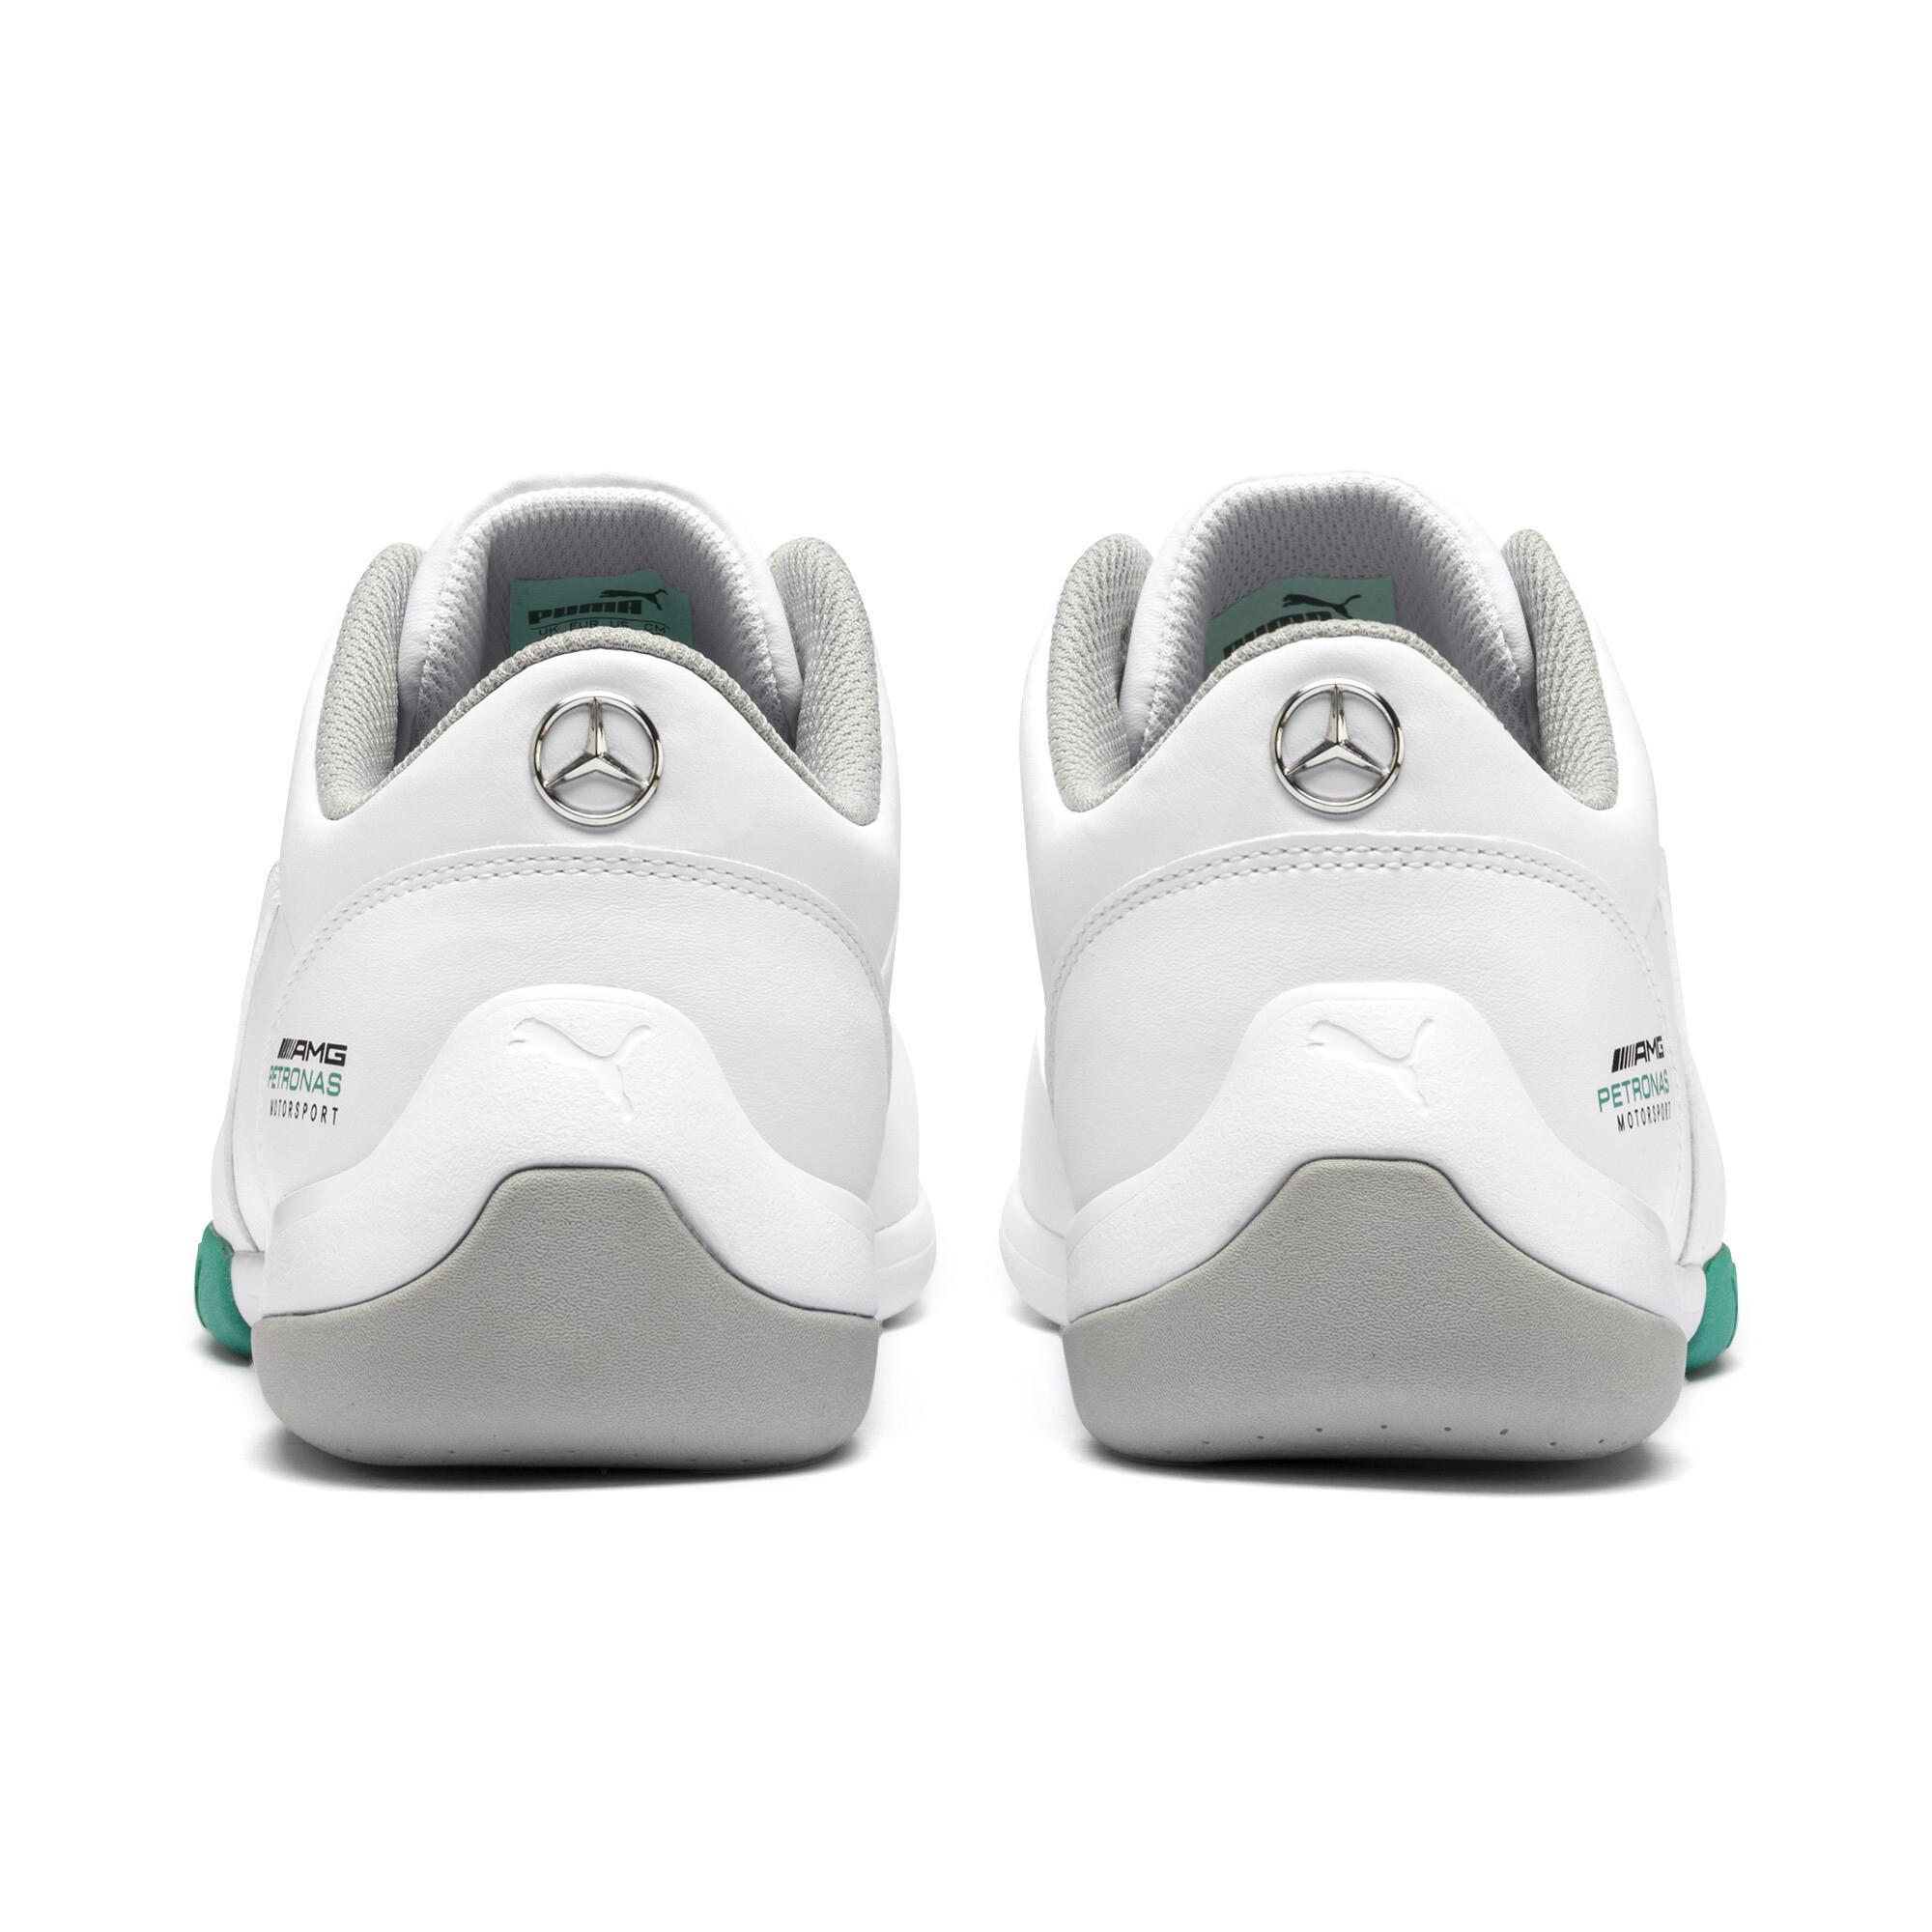 PUMA-Men-039-s-Mercedes-AMG-Petronas-Kart-Cat-III-Shoes thumbnail 3